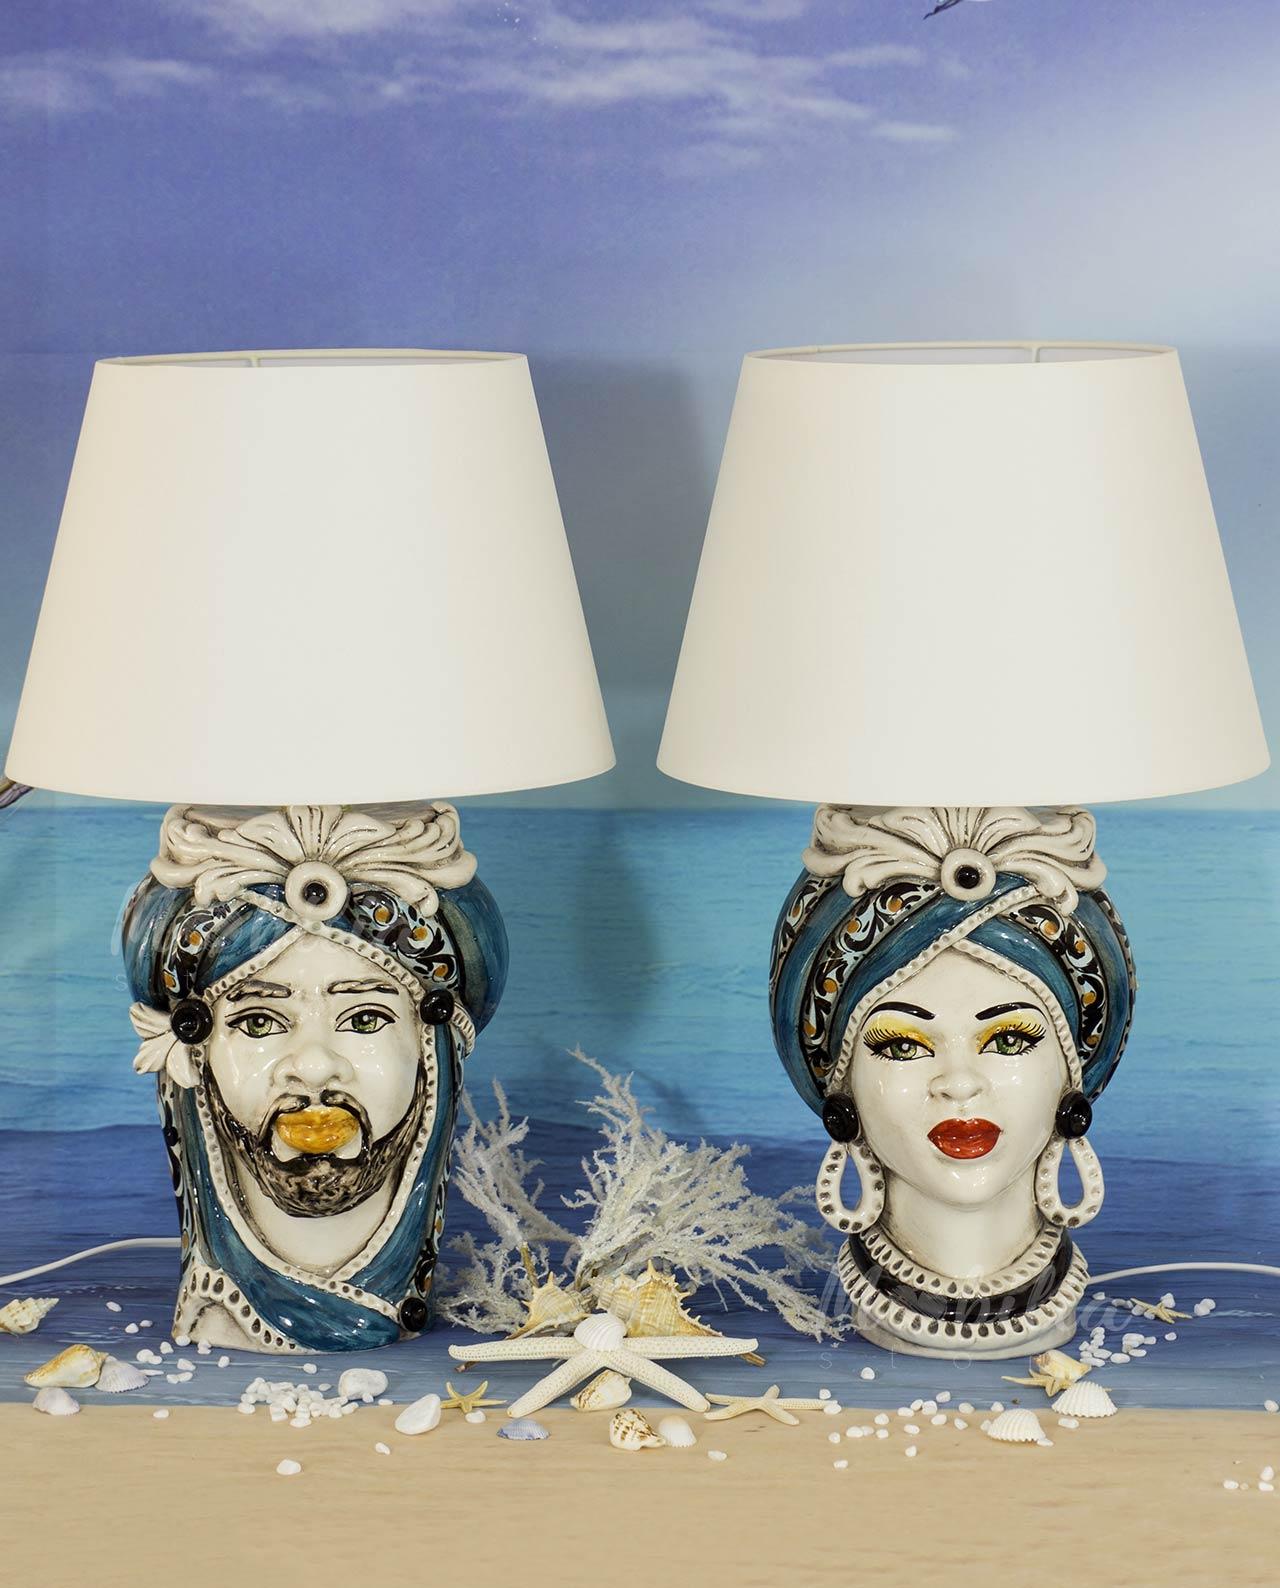 Lampada Testa Di Moro In Ceramica Di Caltagirone Blu Mobilia Store Home Favours